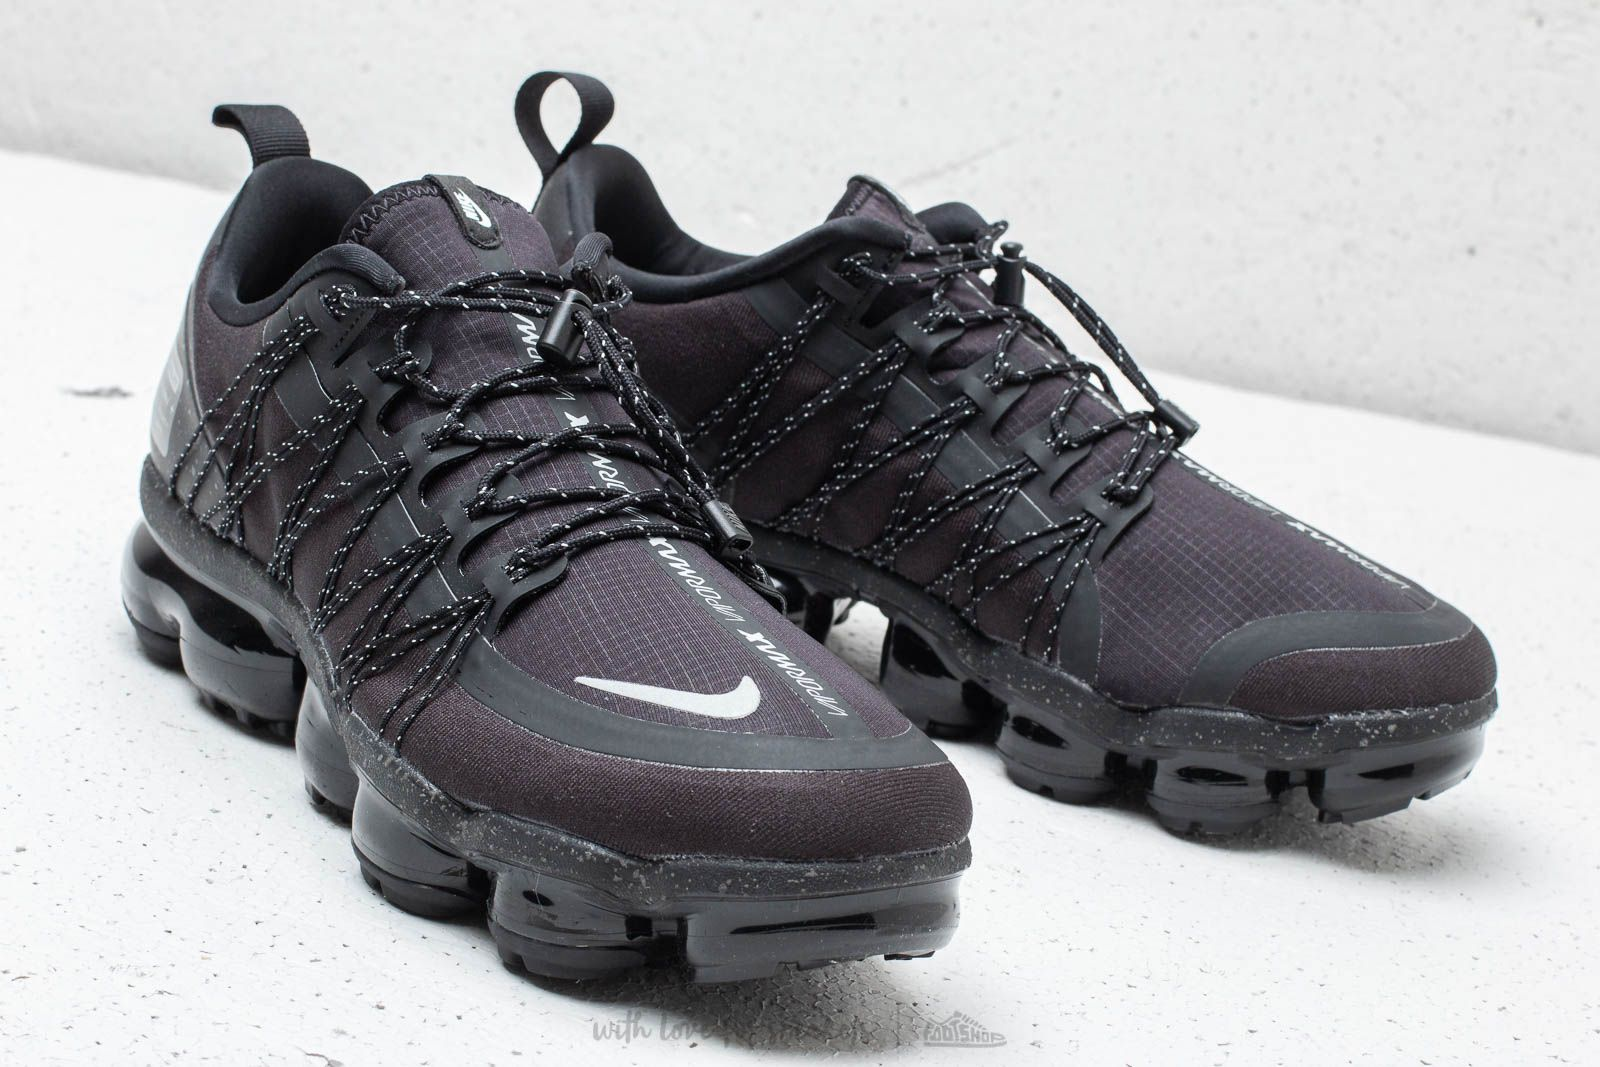 Nike Black Air Reflect Utility SilverFootshop Vapormax Run j3L54AR